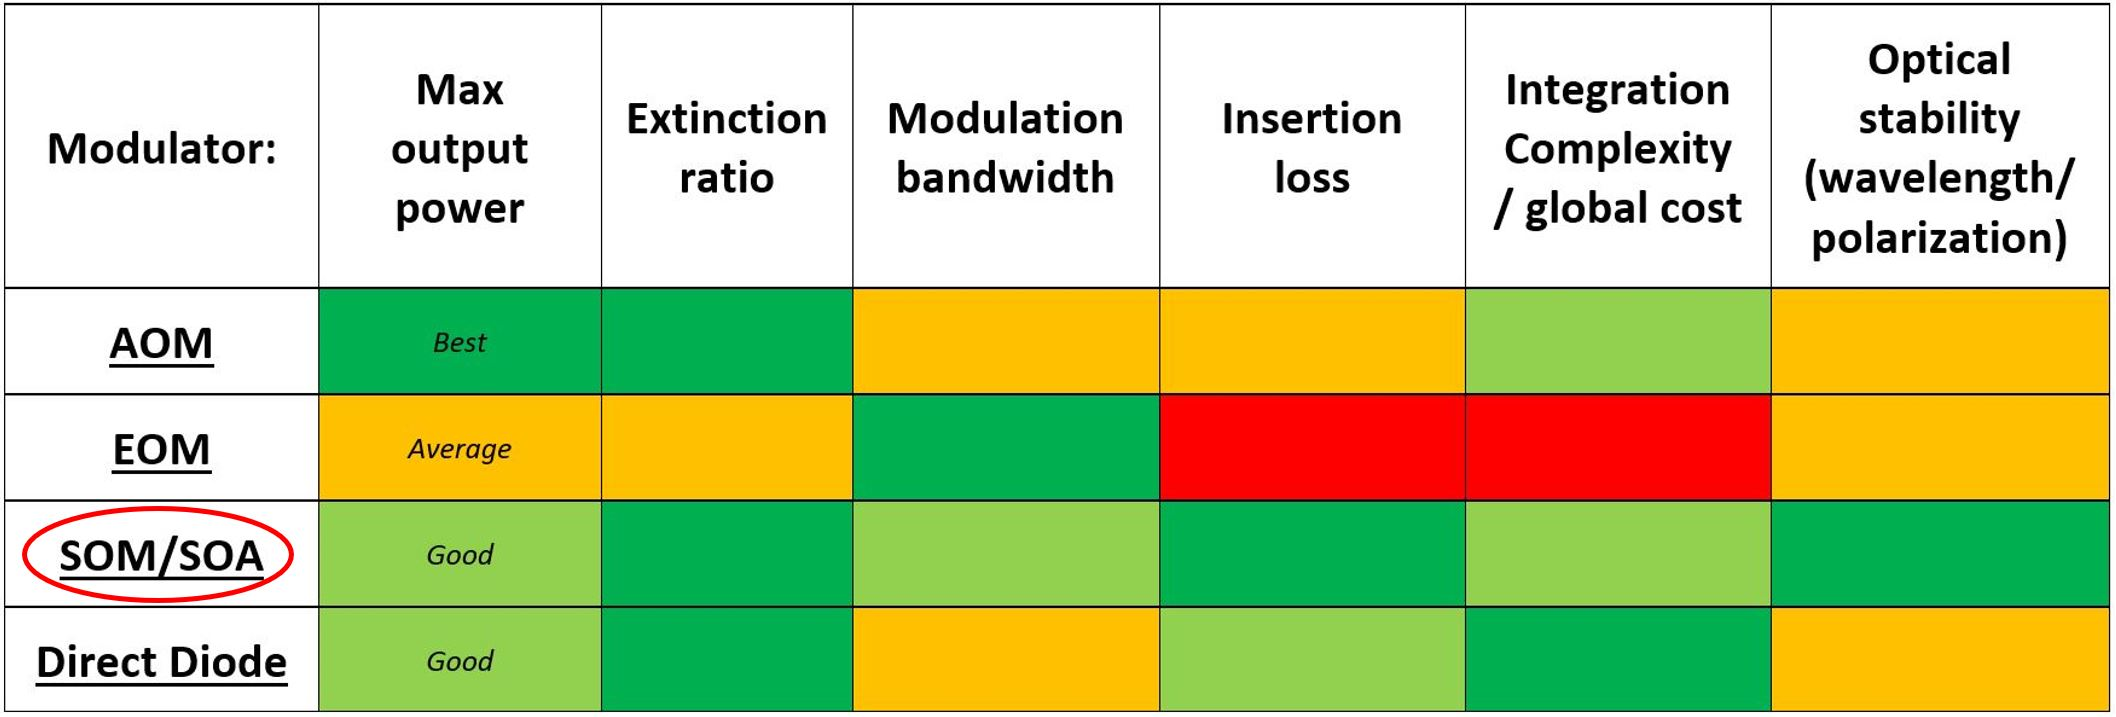 Fiber optic modulators comparison